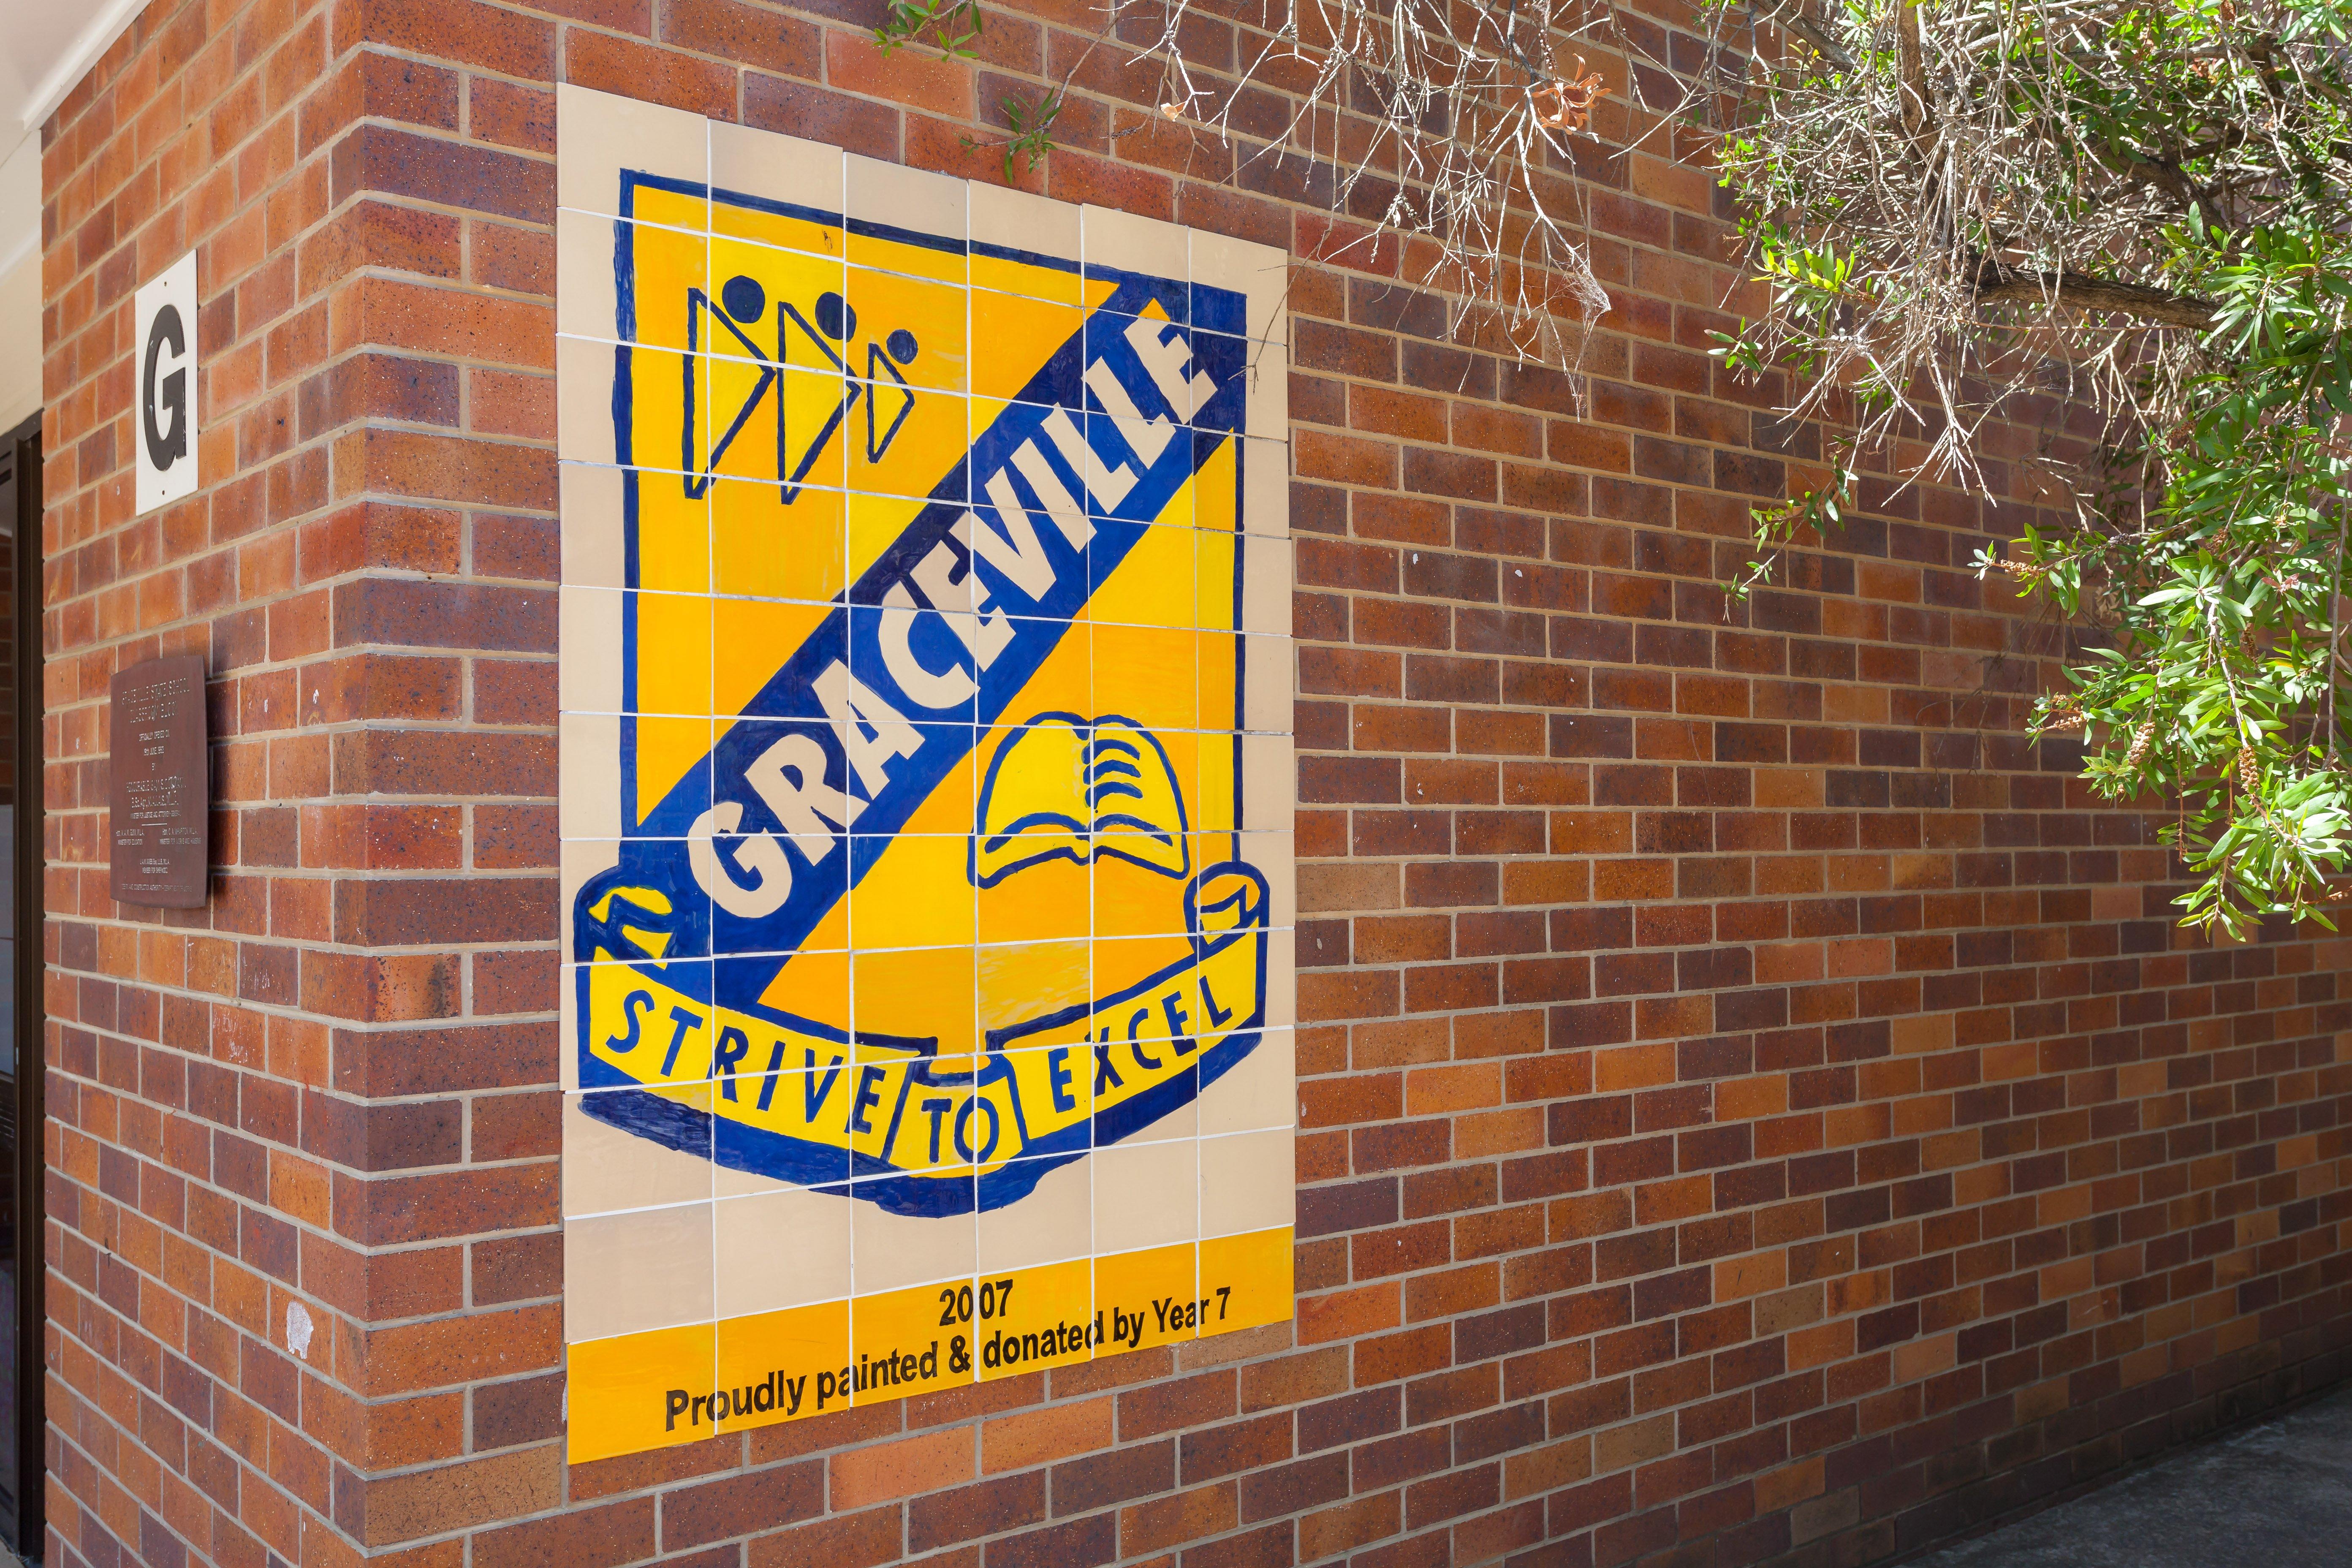 Graceville State Shcool